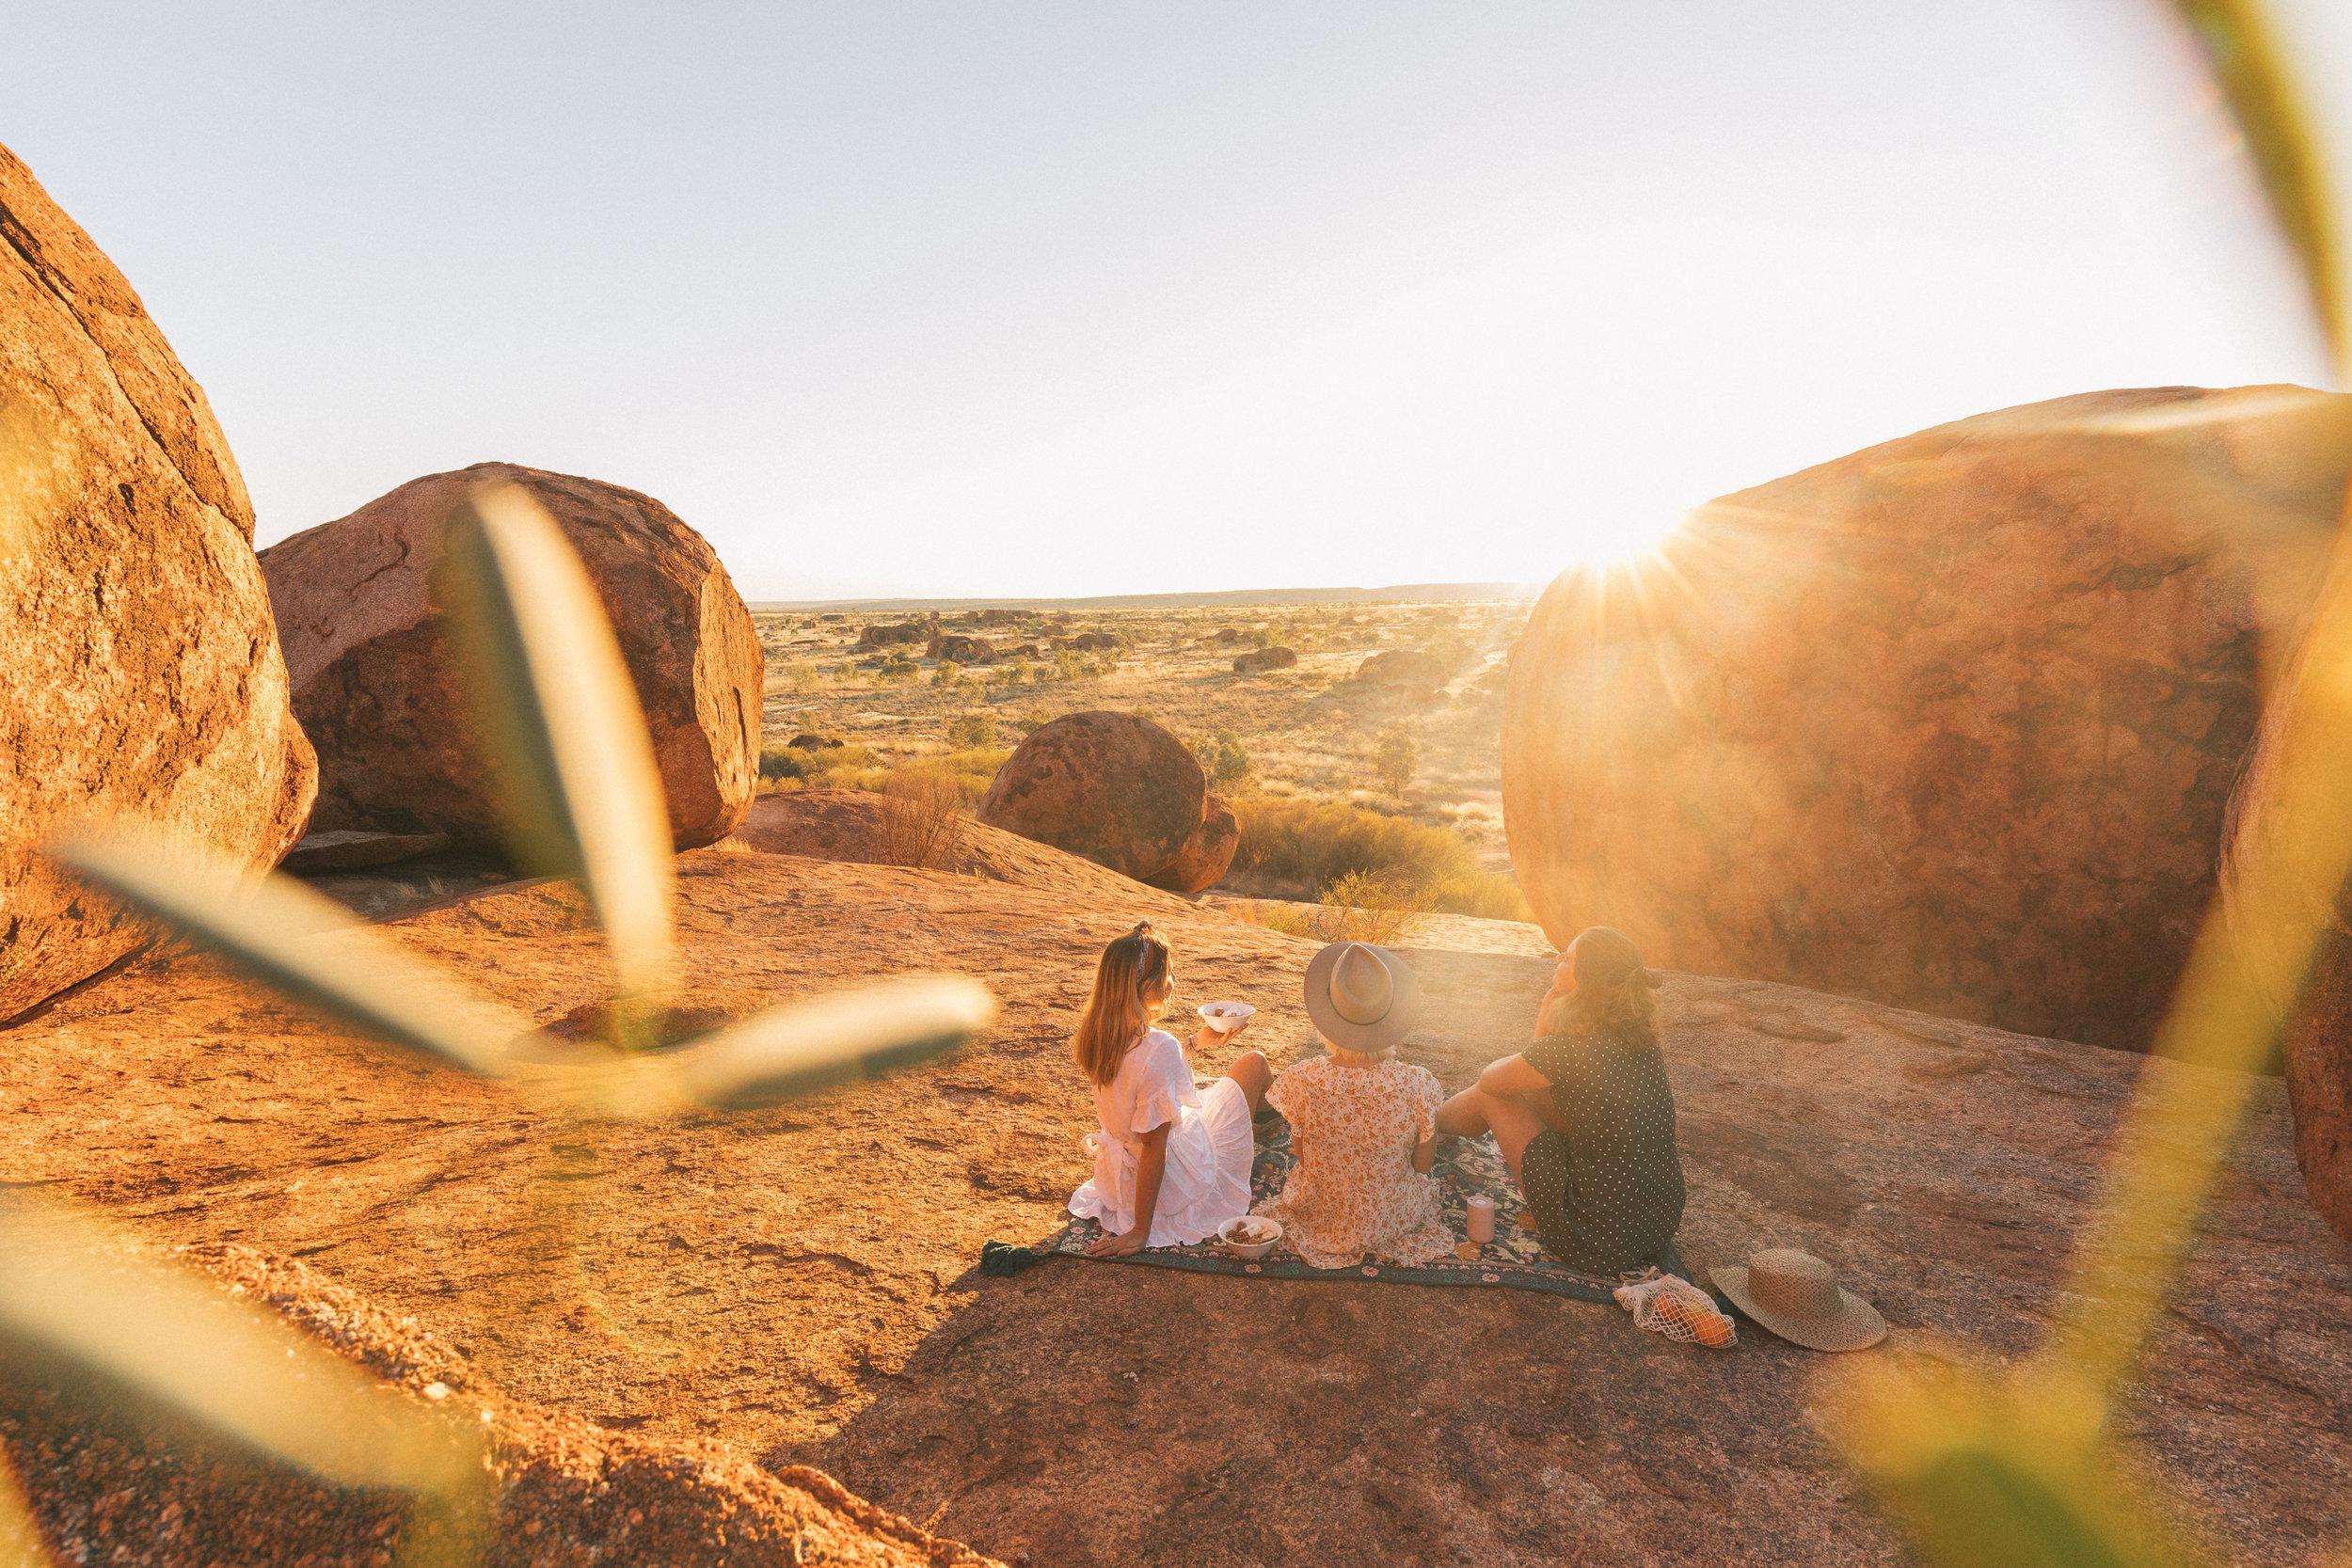 Melissa-Findley-Northern-Territory-Blog-21.jpg